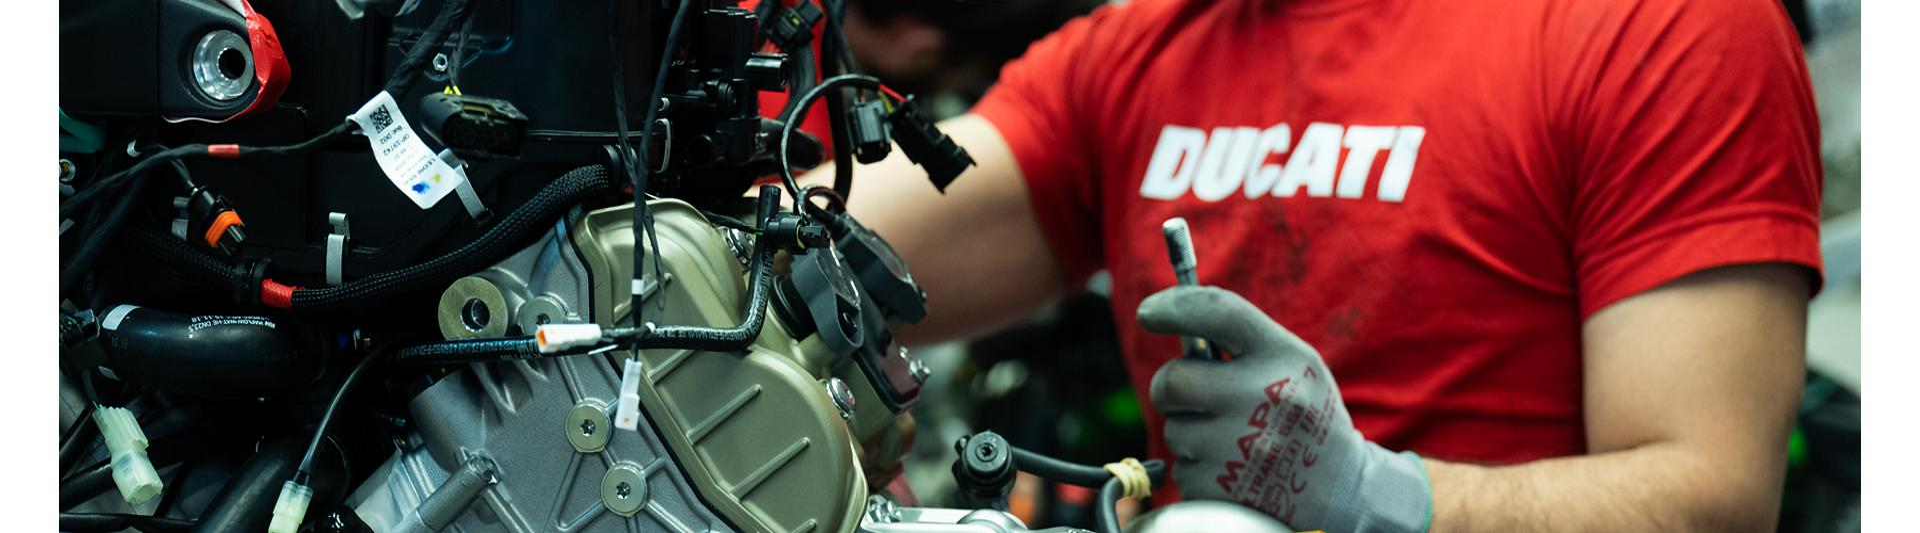 Ducati hero1